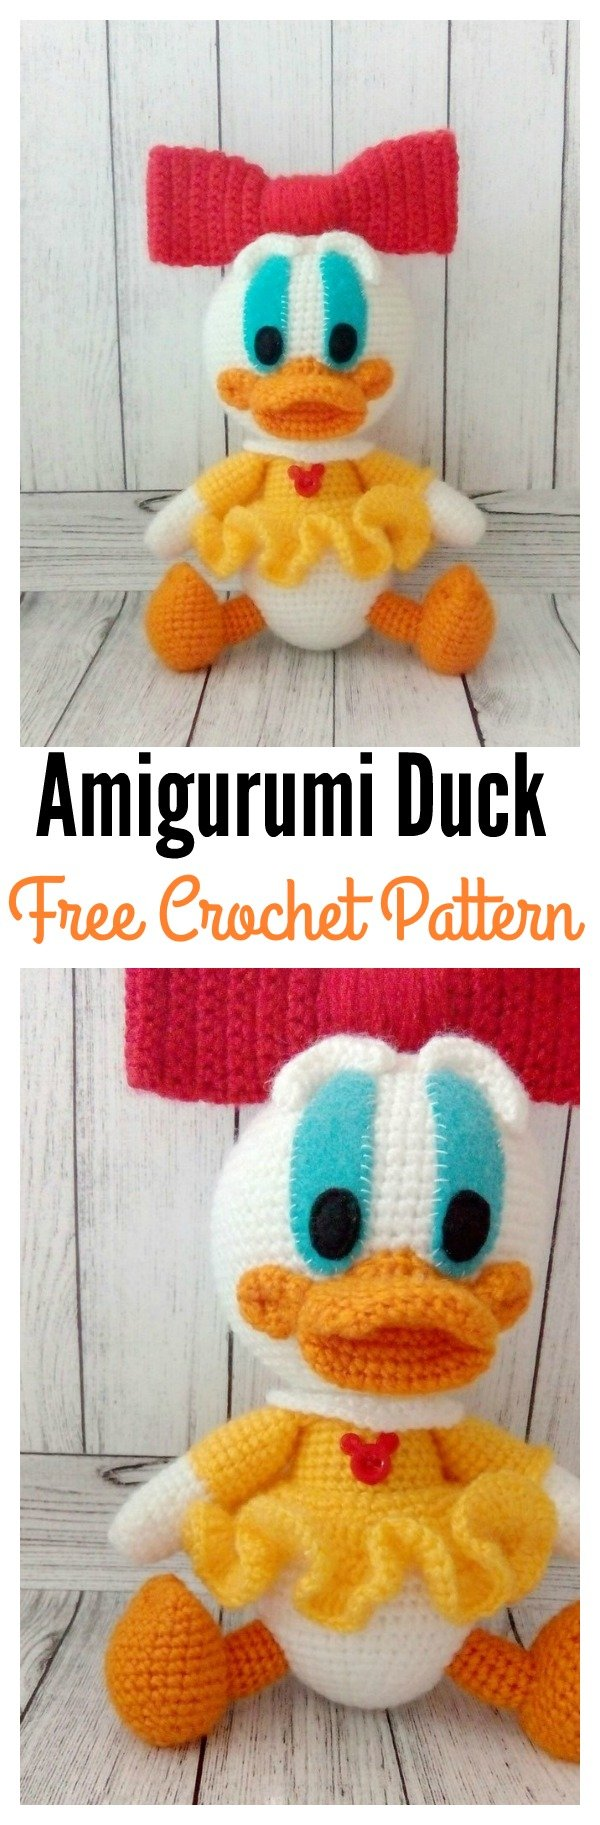 Amigurumi Duck Pattern Free : Free Amigurumi Duck Patterns